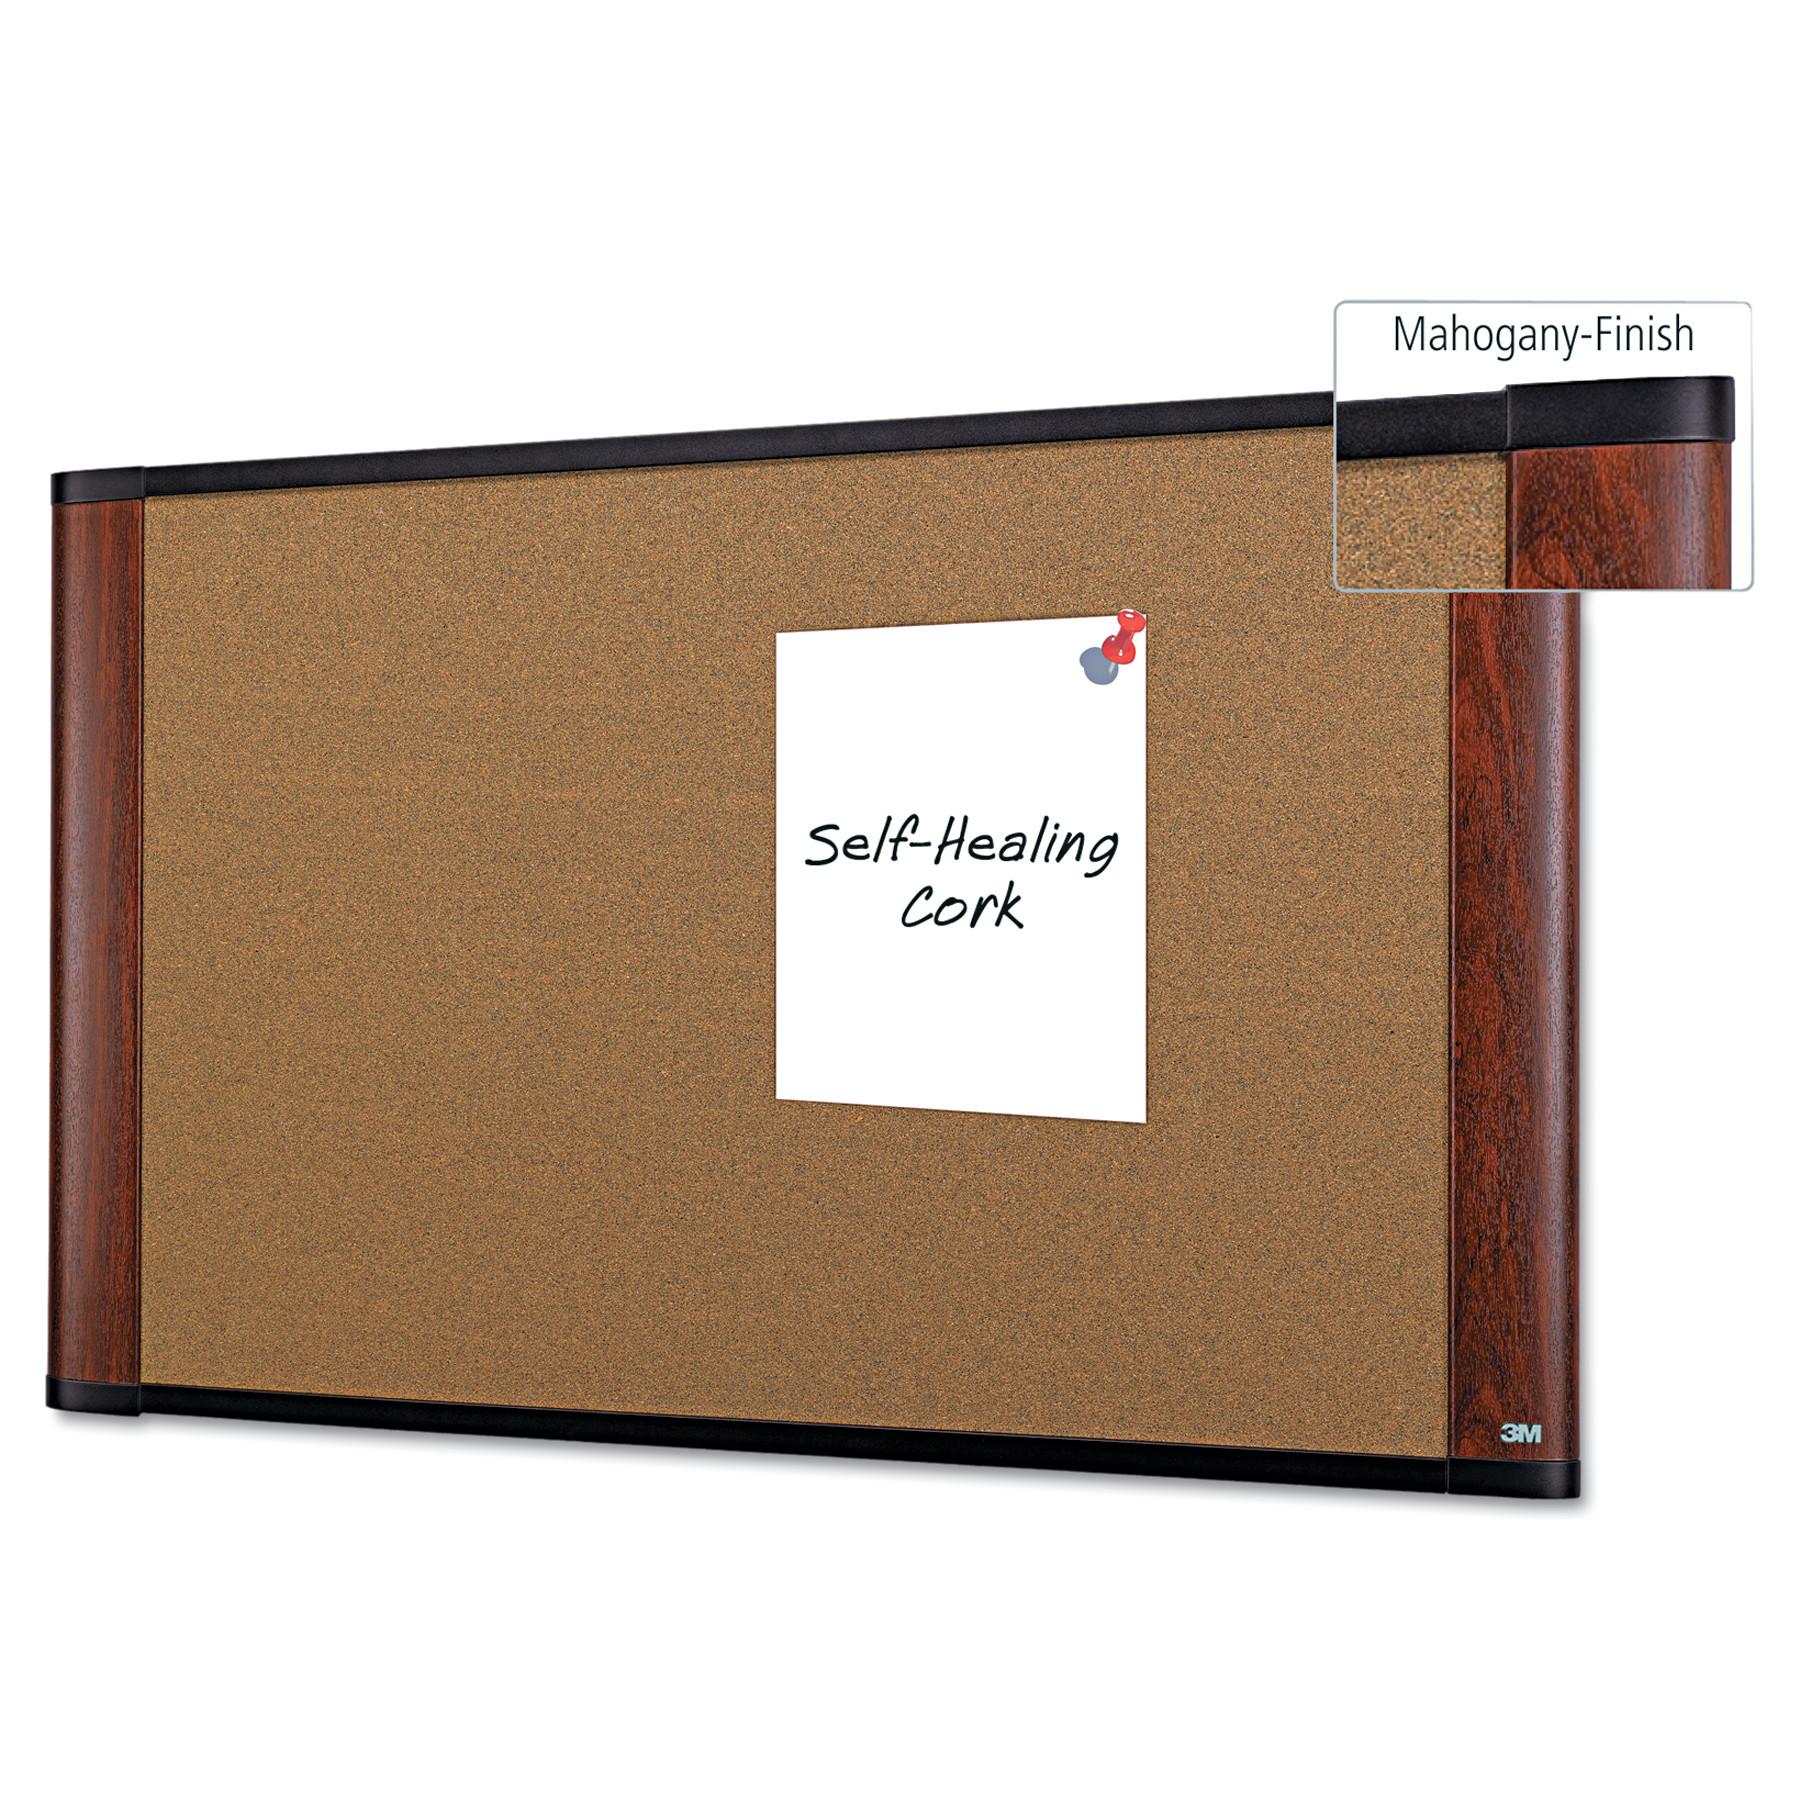 "3M Widescreen Cork Board, 48""x 36"", Mahogany-Finish Frame"